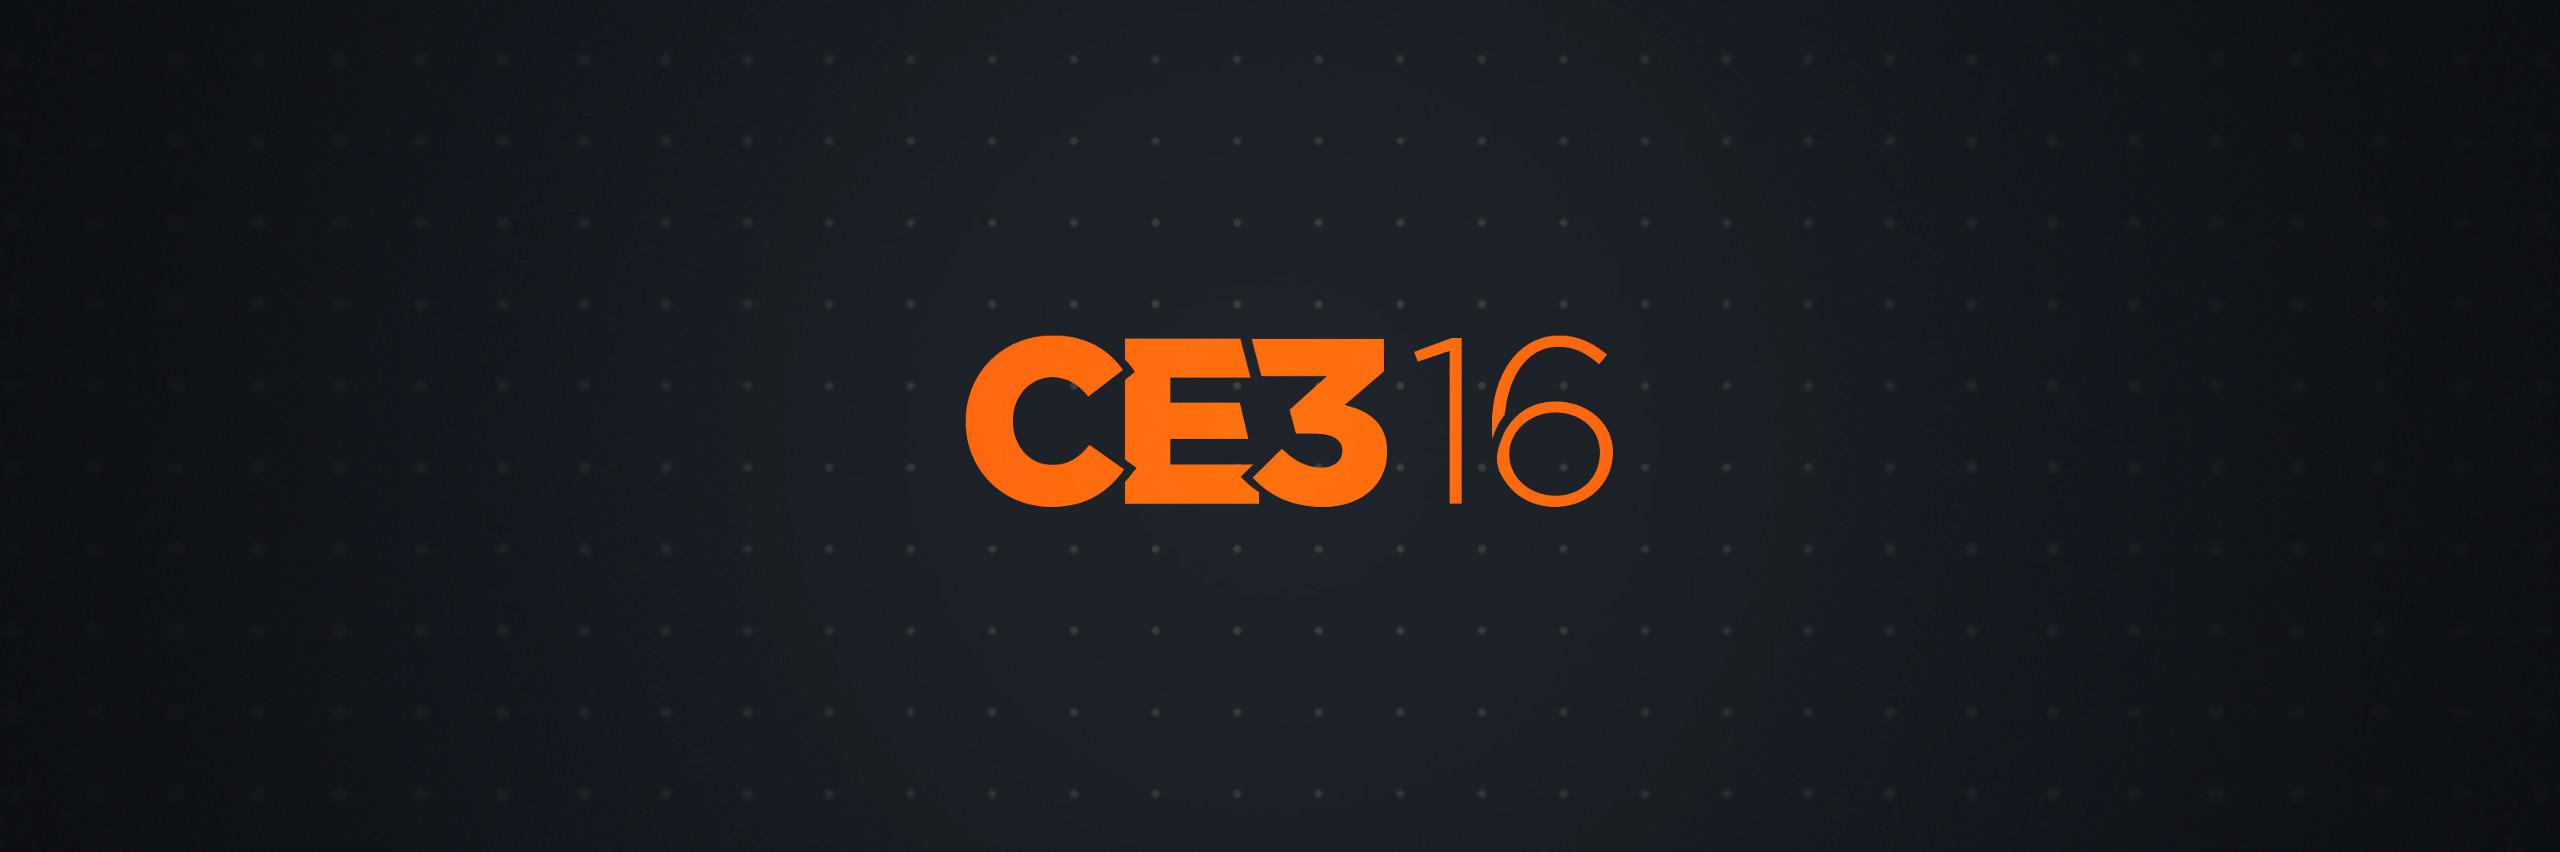 Halo CE3 2016 Live